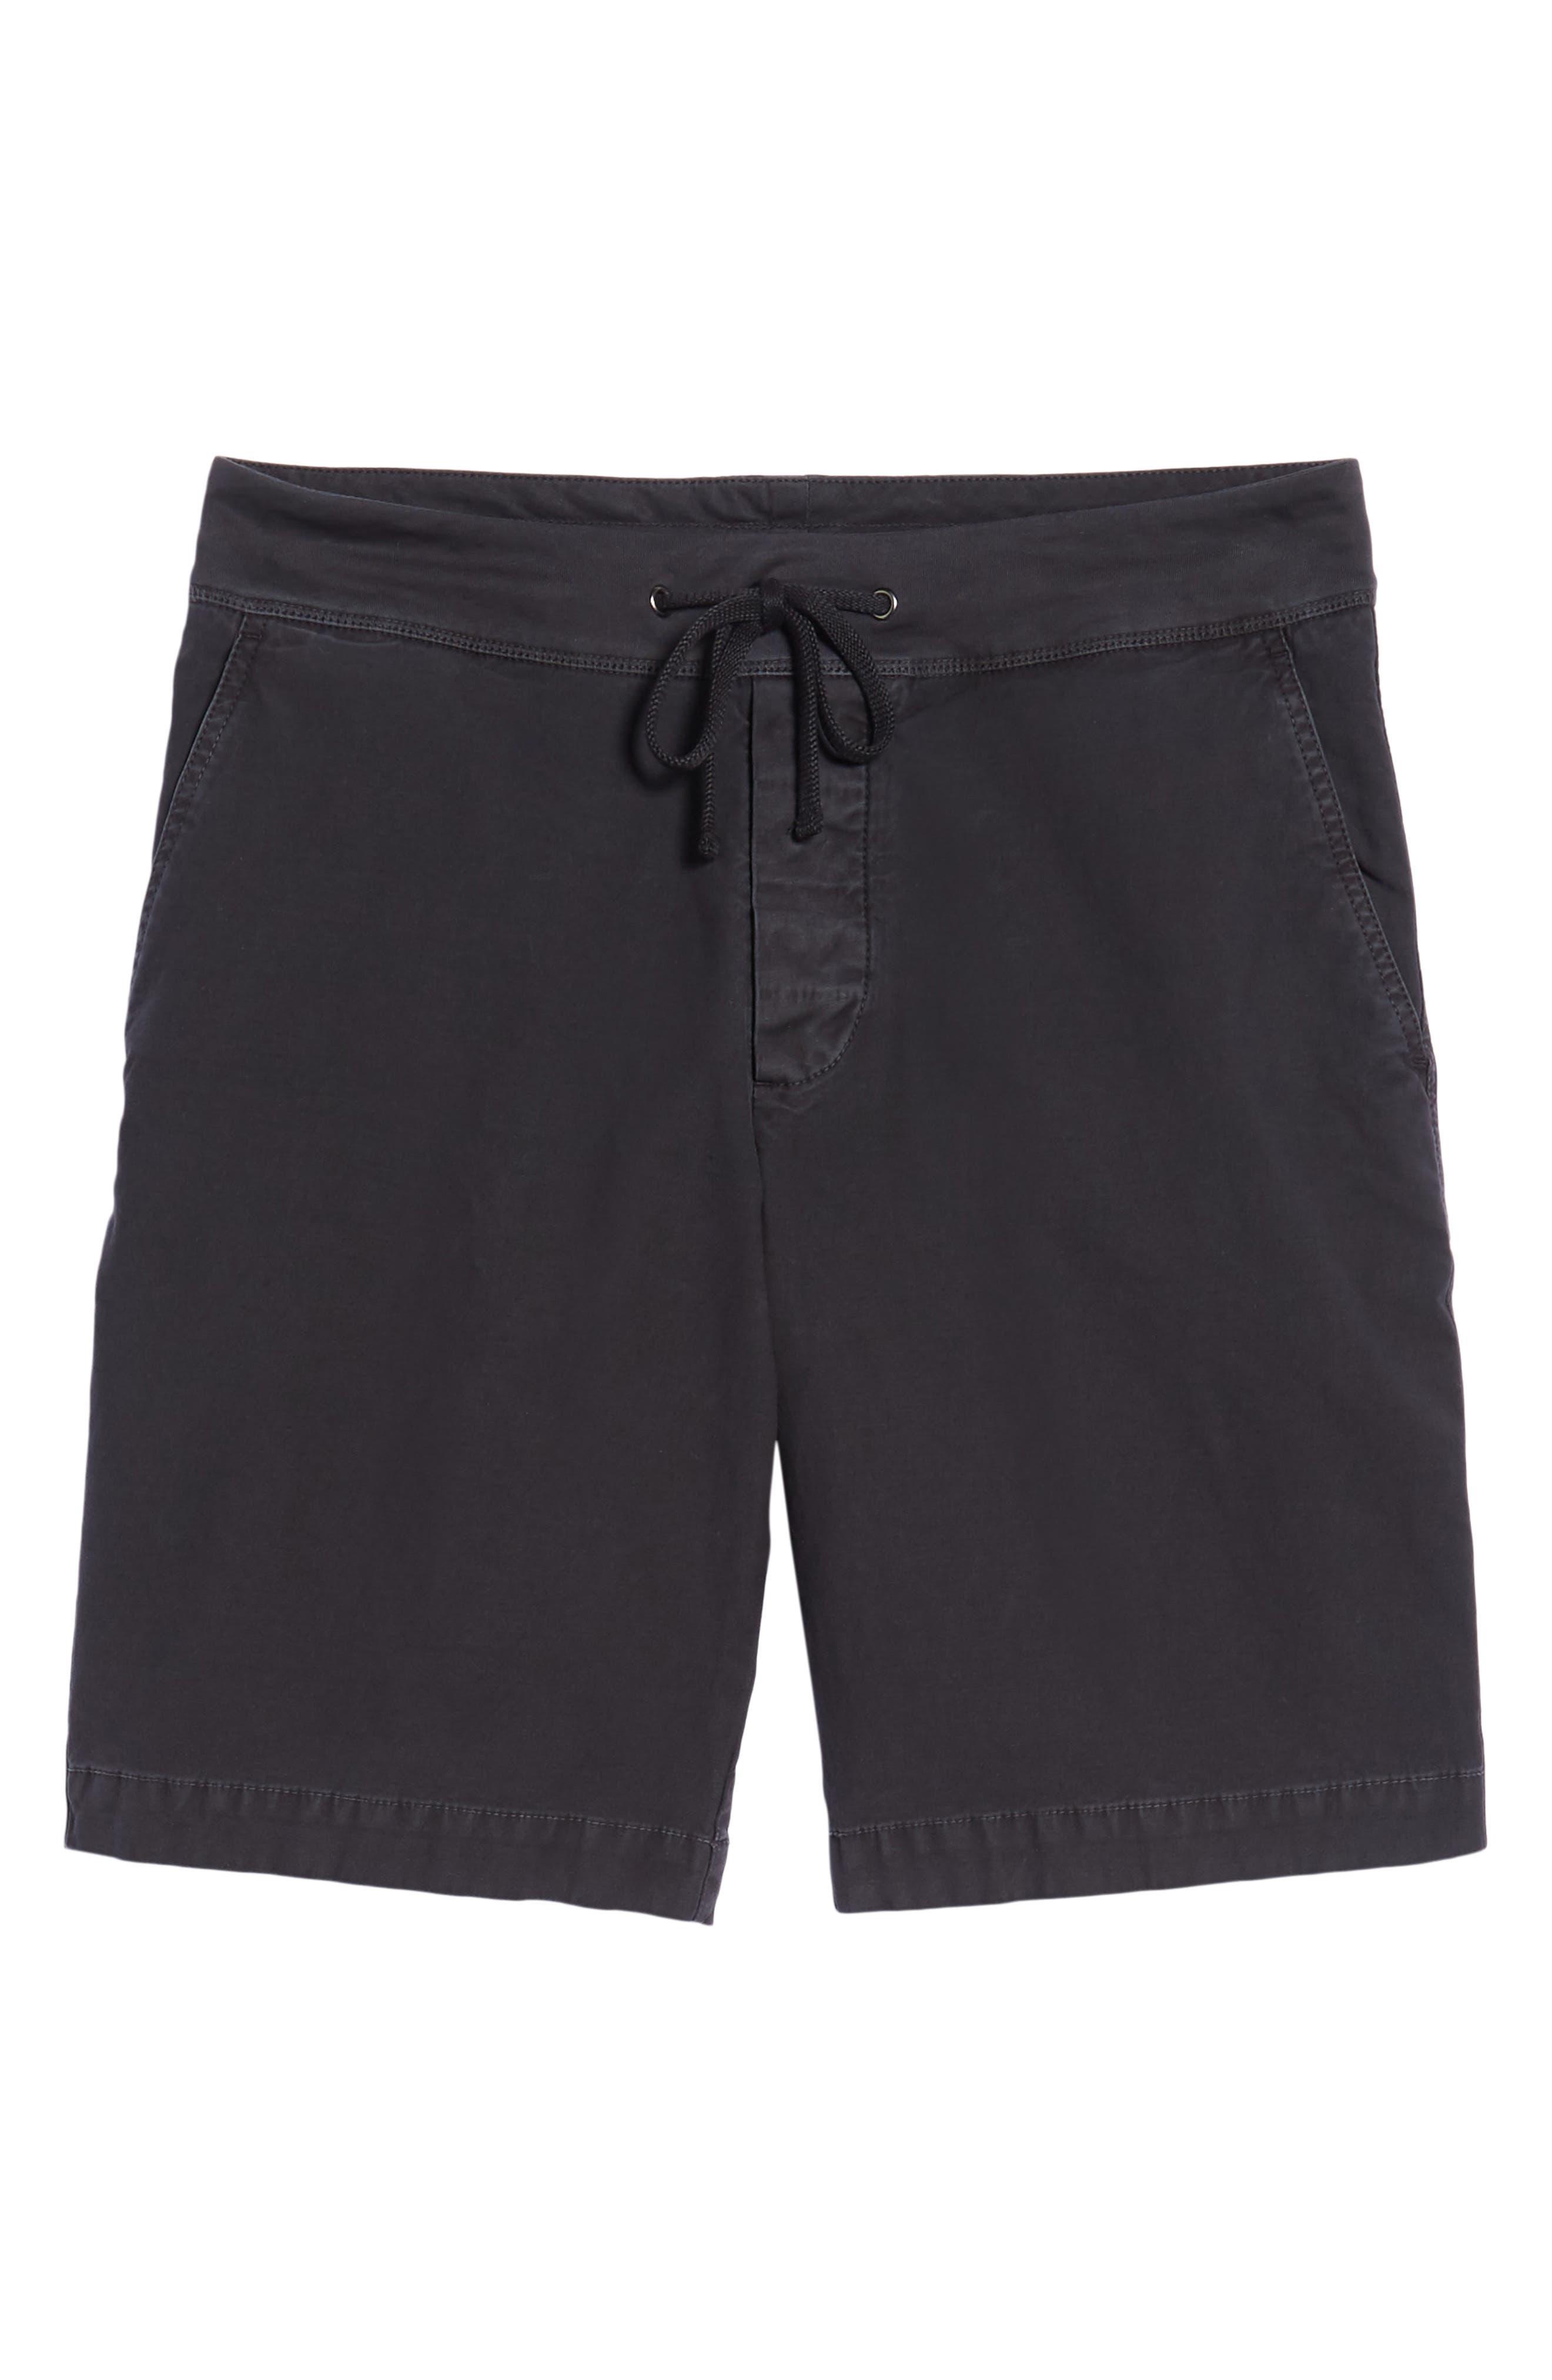 Compact Stretch Cotton Shorts,                             Alternate thumbnail 6, color,                             020